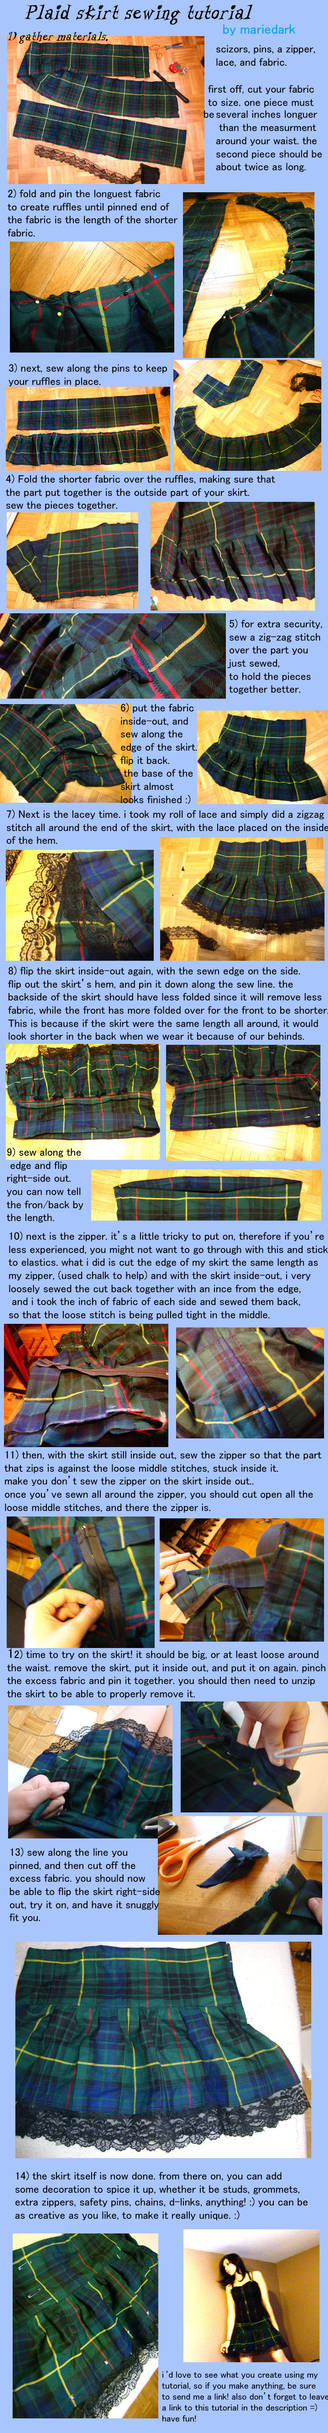 plaid skirt sewing tutorial